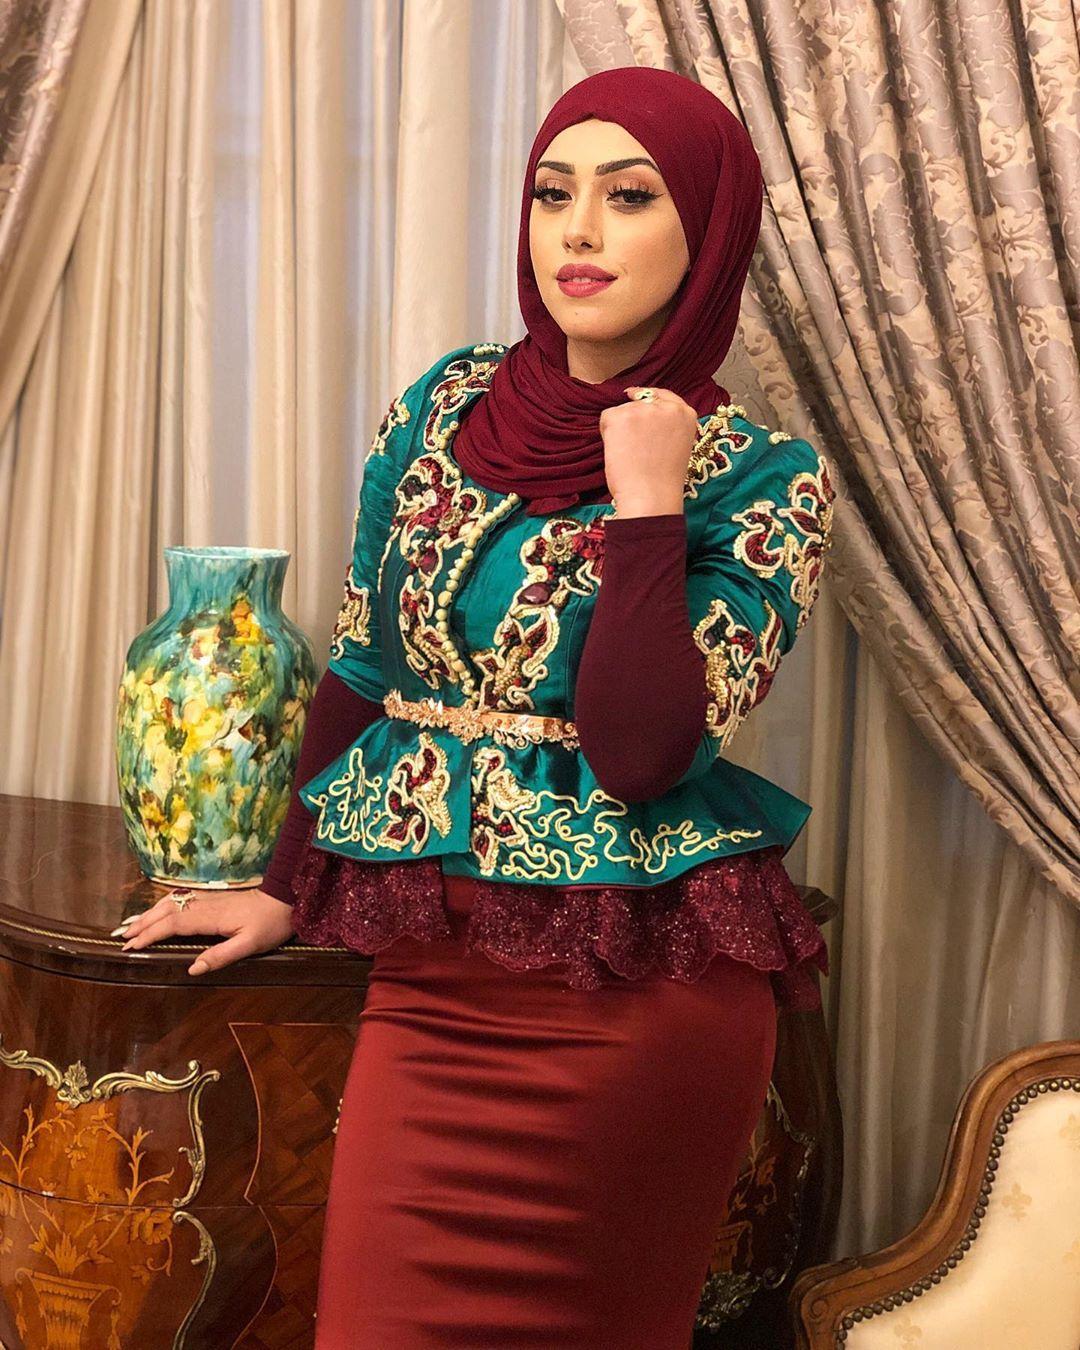 Manelhadli Aid Karakou Alerian Algeria Traditional Outfits Fashion Traditional Dresses